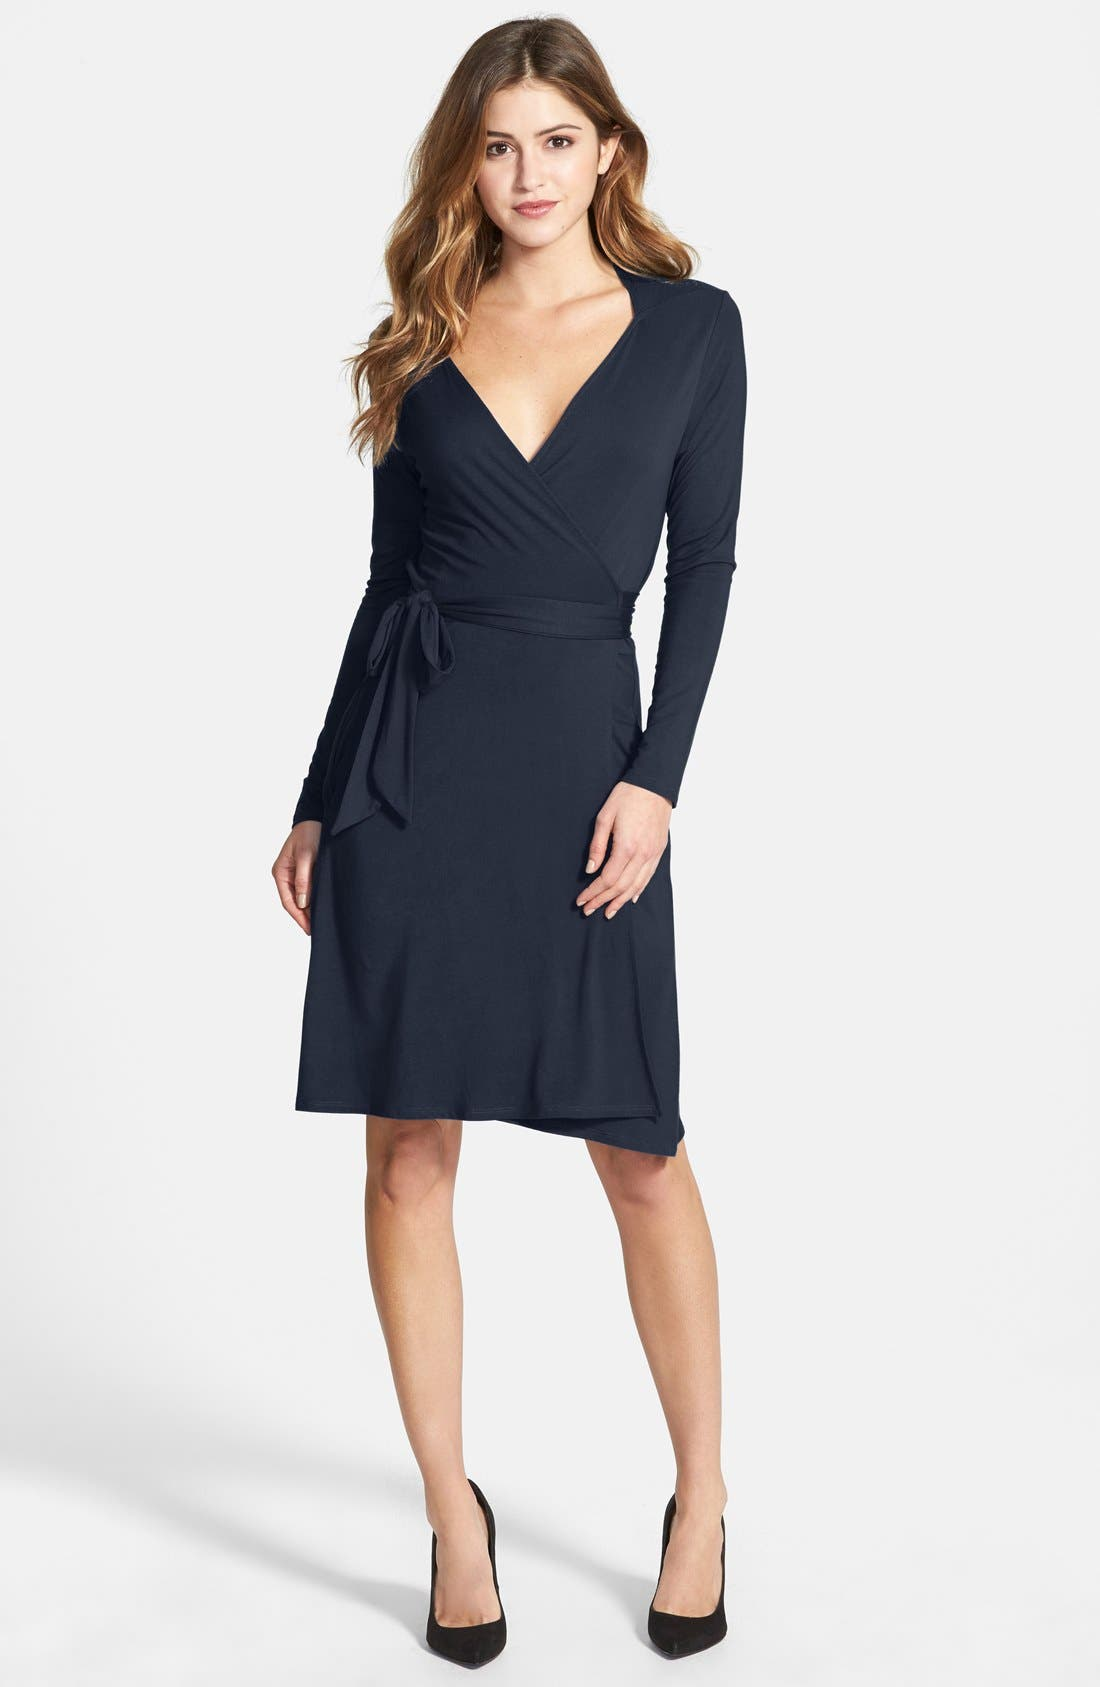 Alternate Image 1 Selected - Loveappella Seamed Wrap Dress (Regular & Petite)